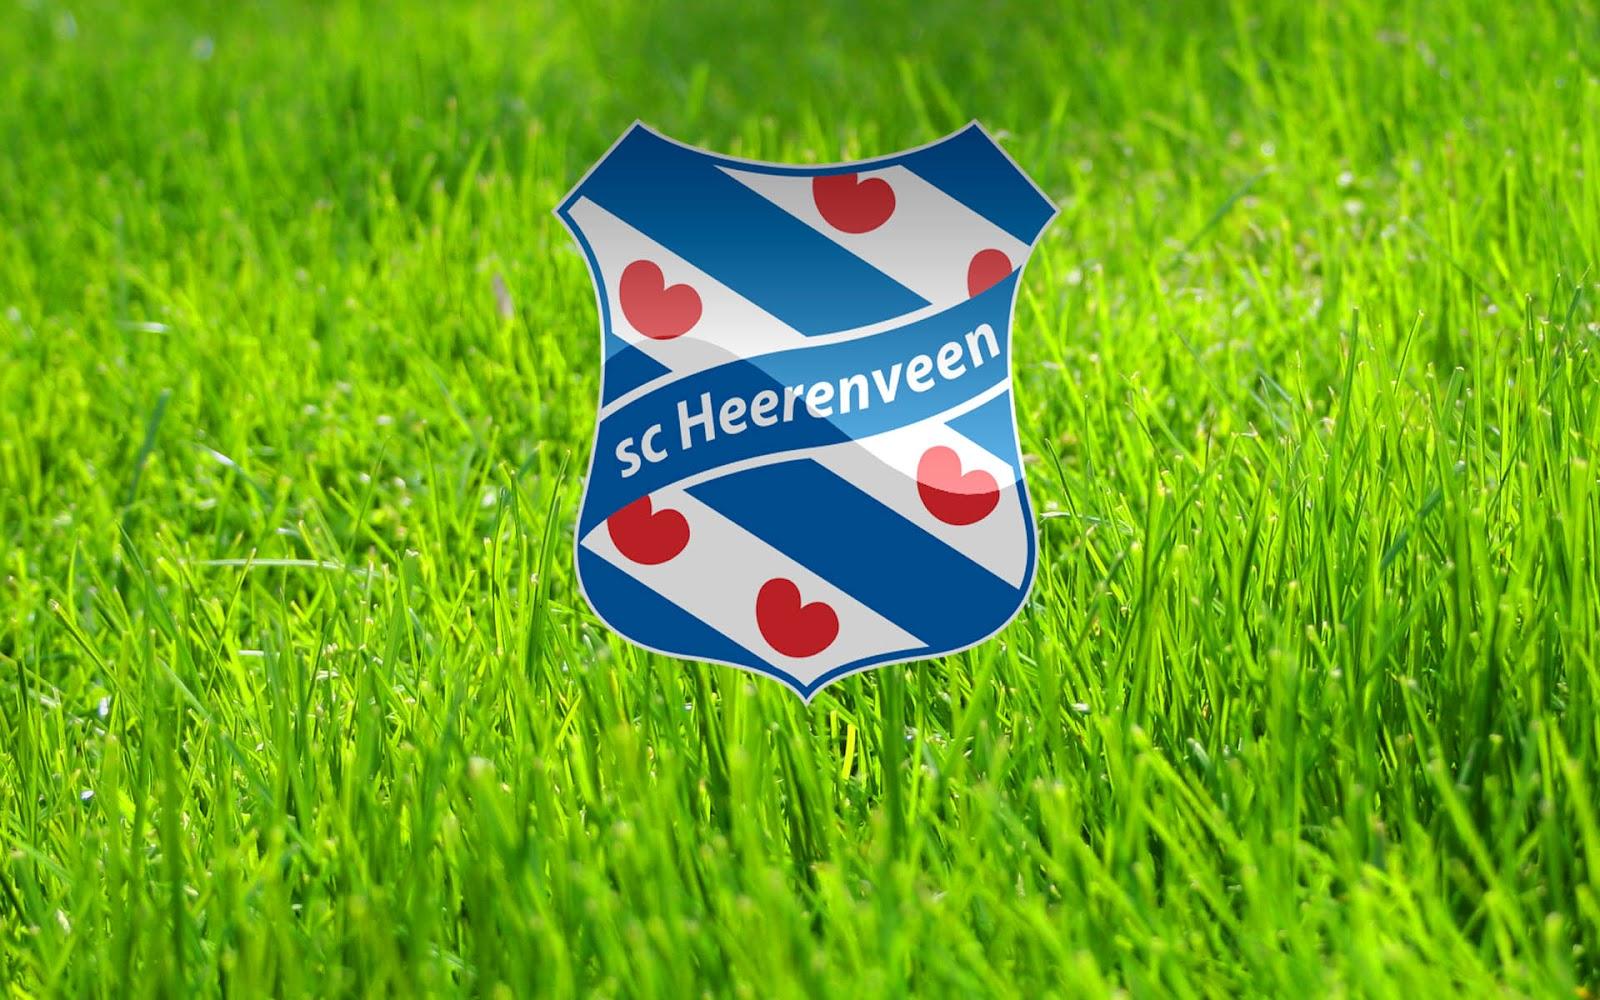 Chùm ảnh: SC Heerenveen jersey (29)